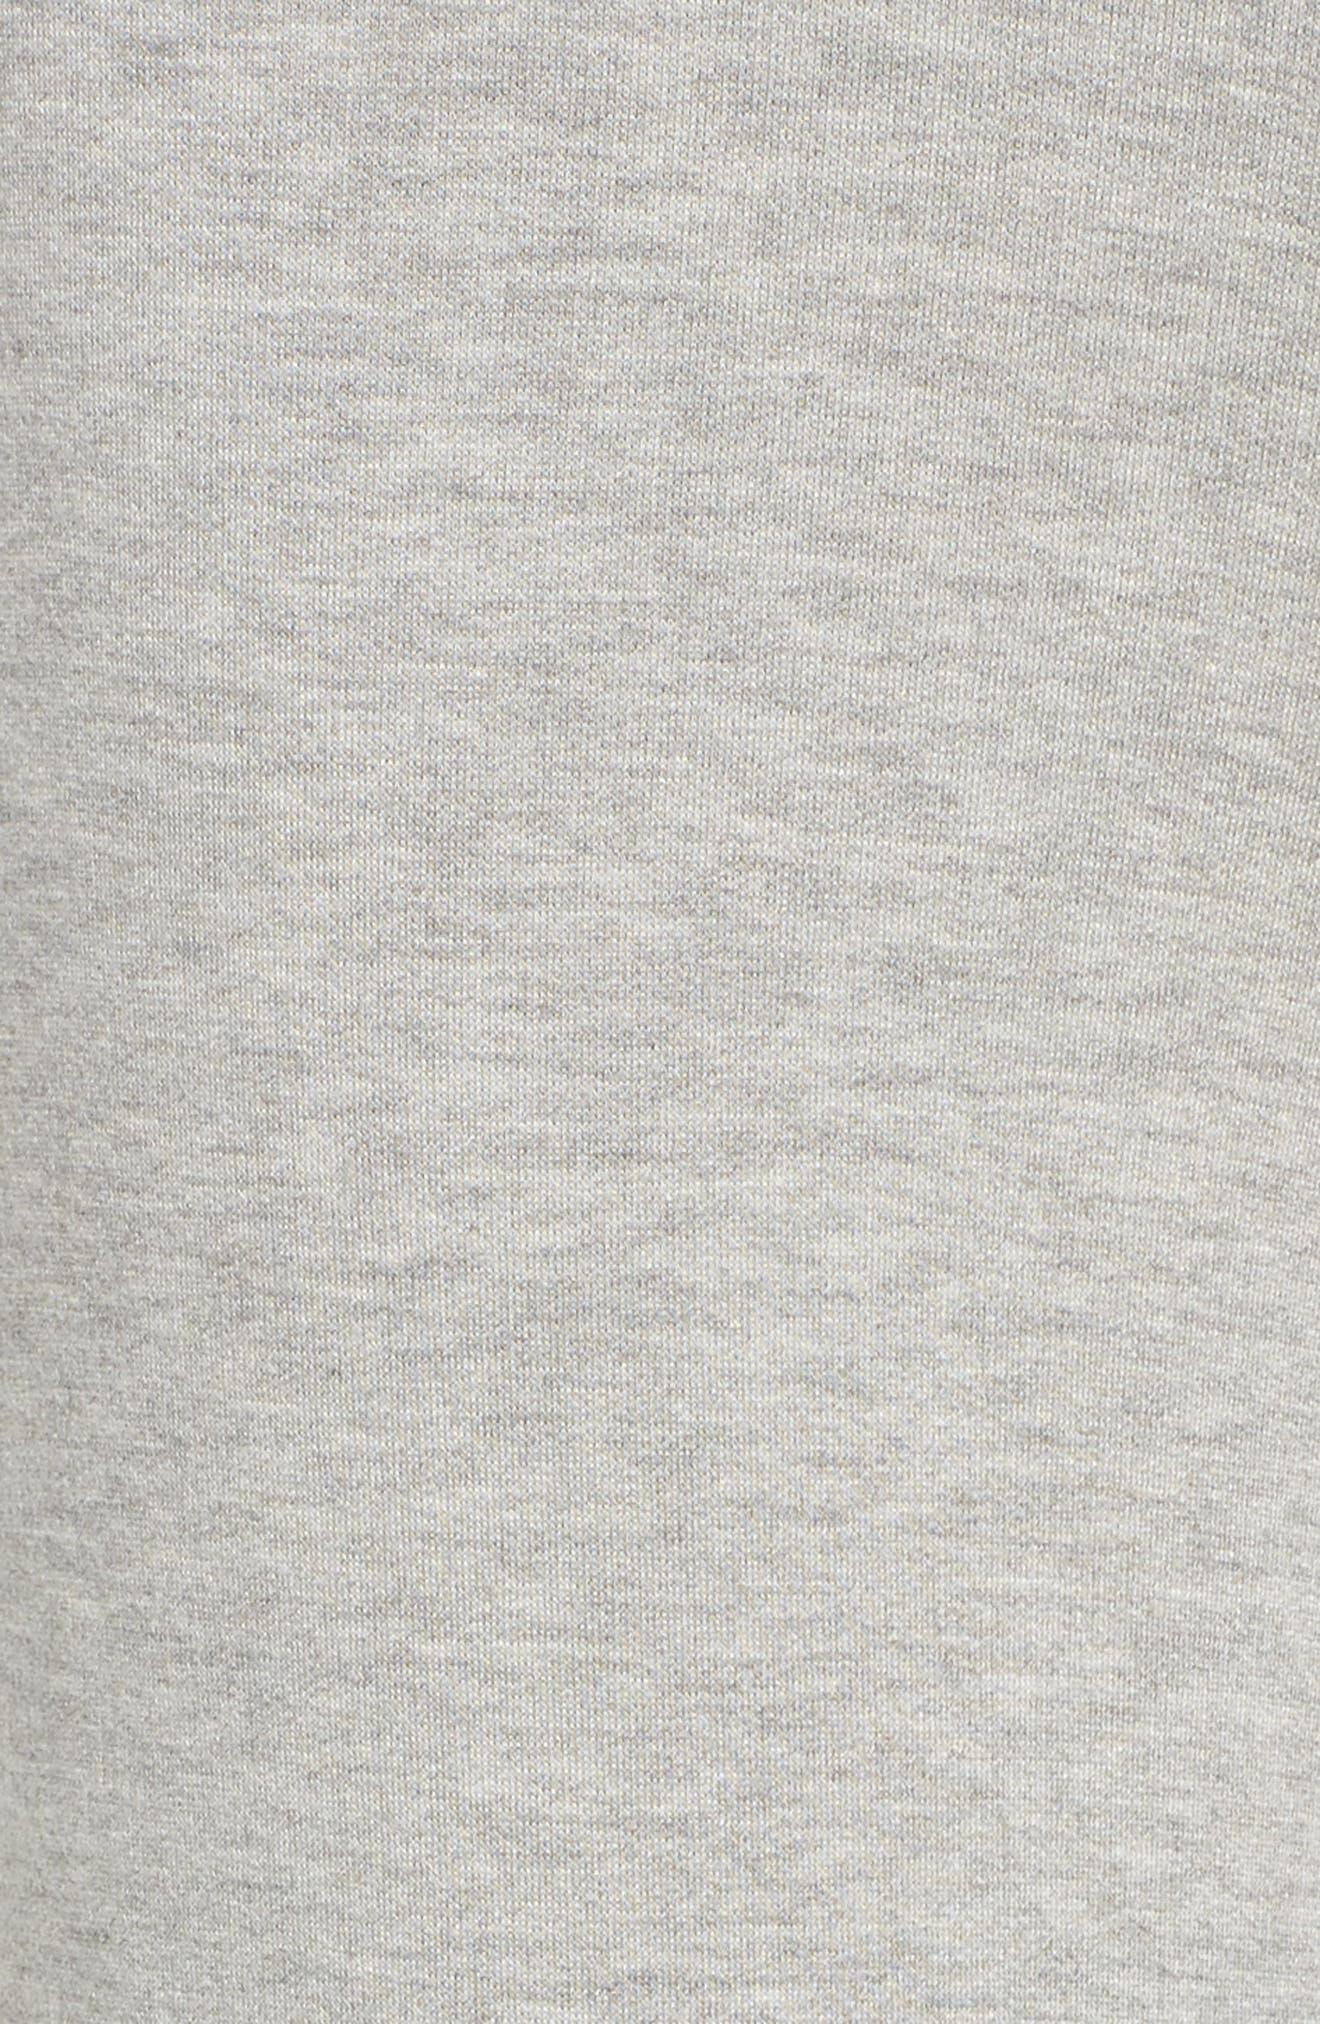 Runway Culotte Sweatpants,                             Alternate thumbnail 6, color,                             Light Heather Grey